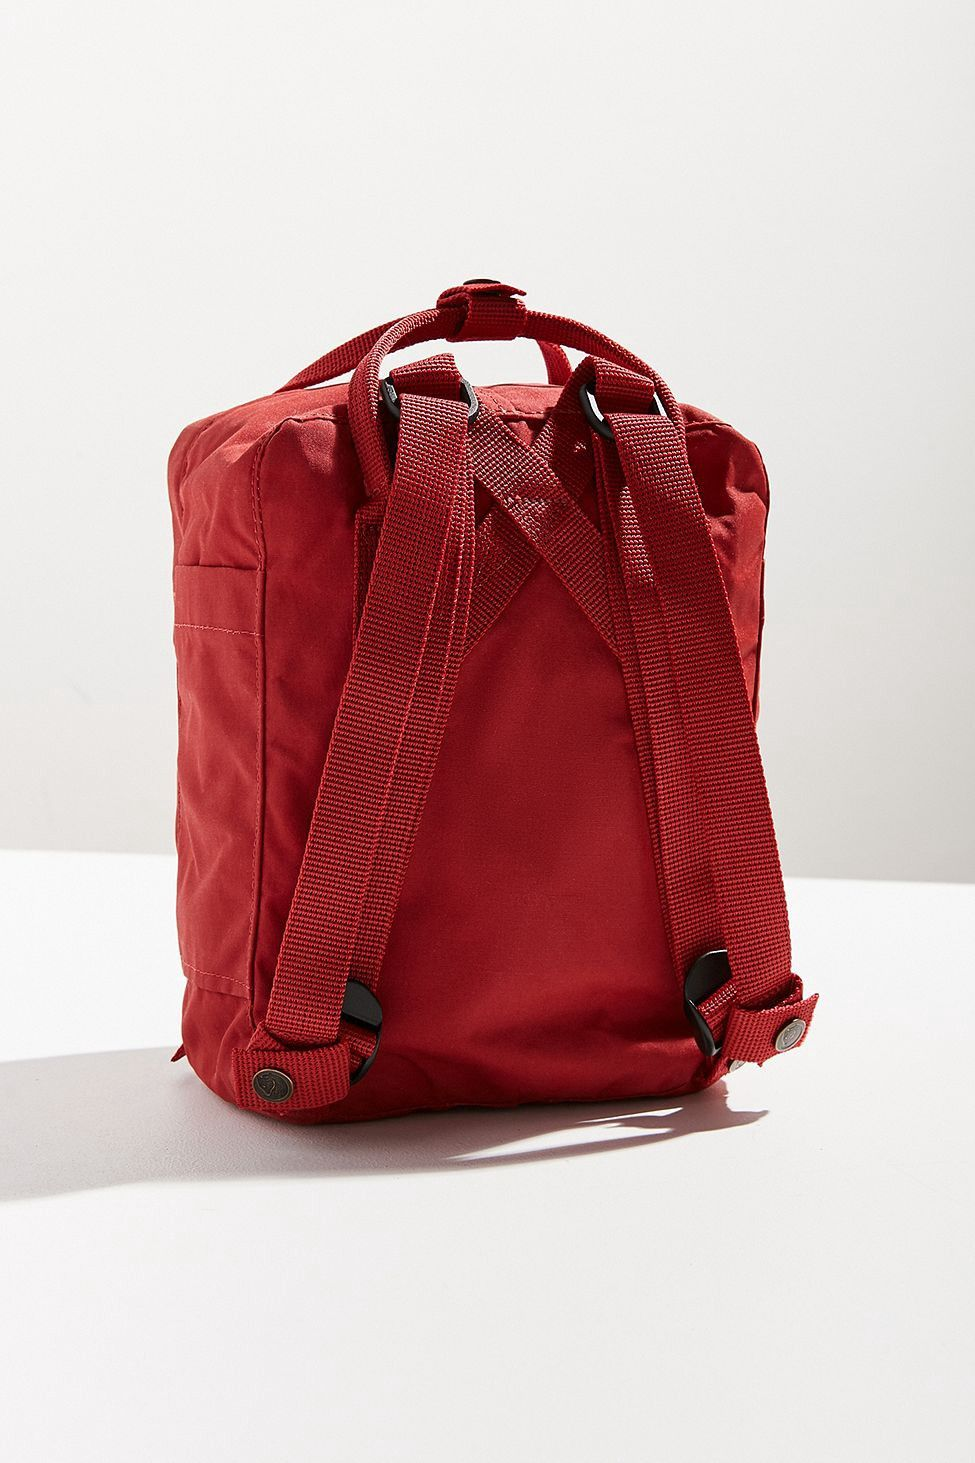 Urban Outfitters Fjallraven Kanken Mini Backpack Frost Green Pink One Size Kanken Mini Kanken Classic Handbags Michael Kors